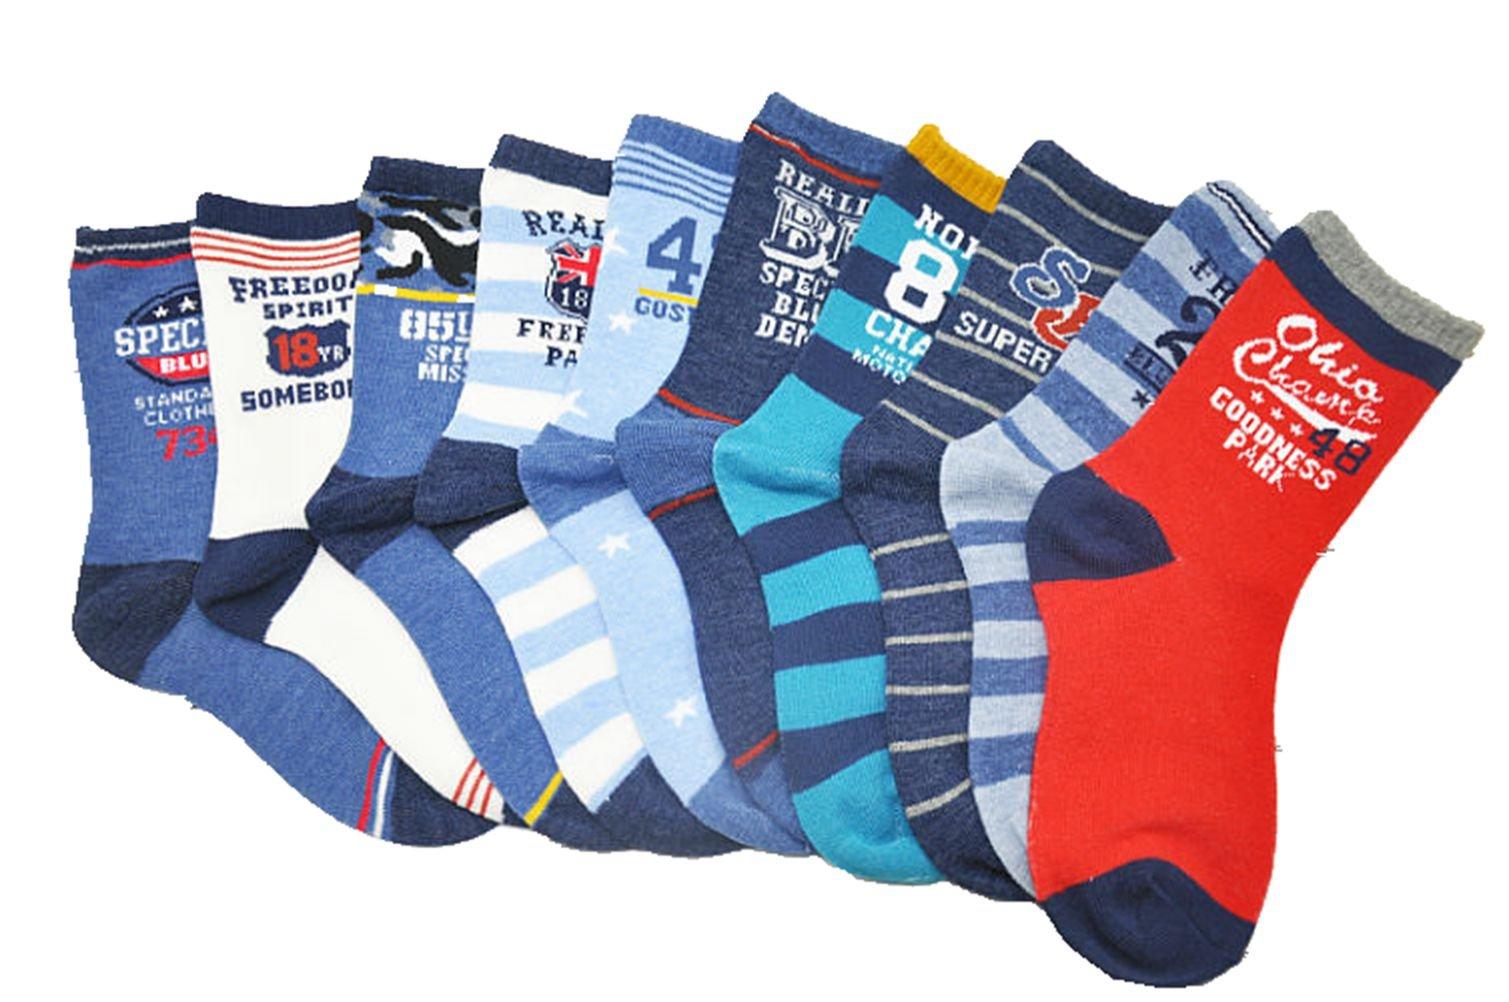 Boys Short Socks Fashion Numbers Cotton Basic Crew Kids Socks 10 Pair Pack by Czofnjesi (Image #2)